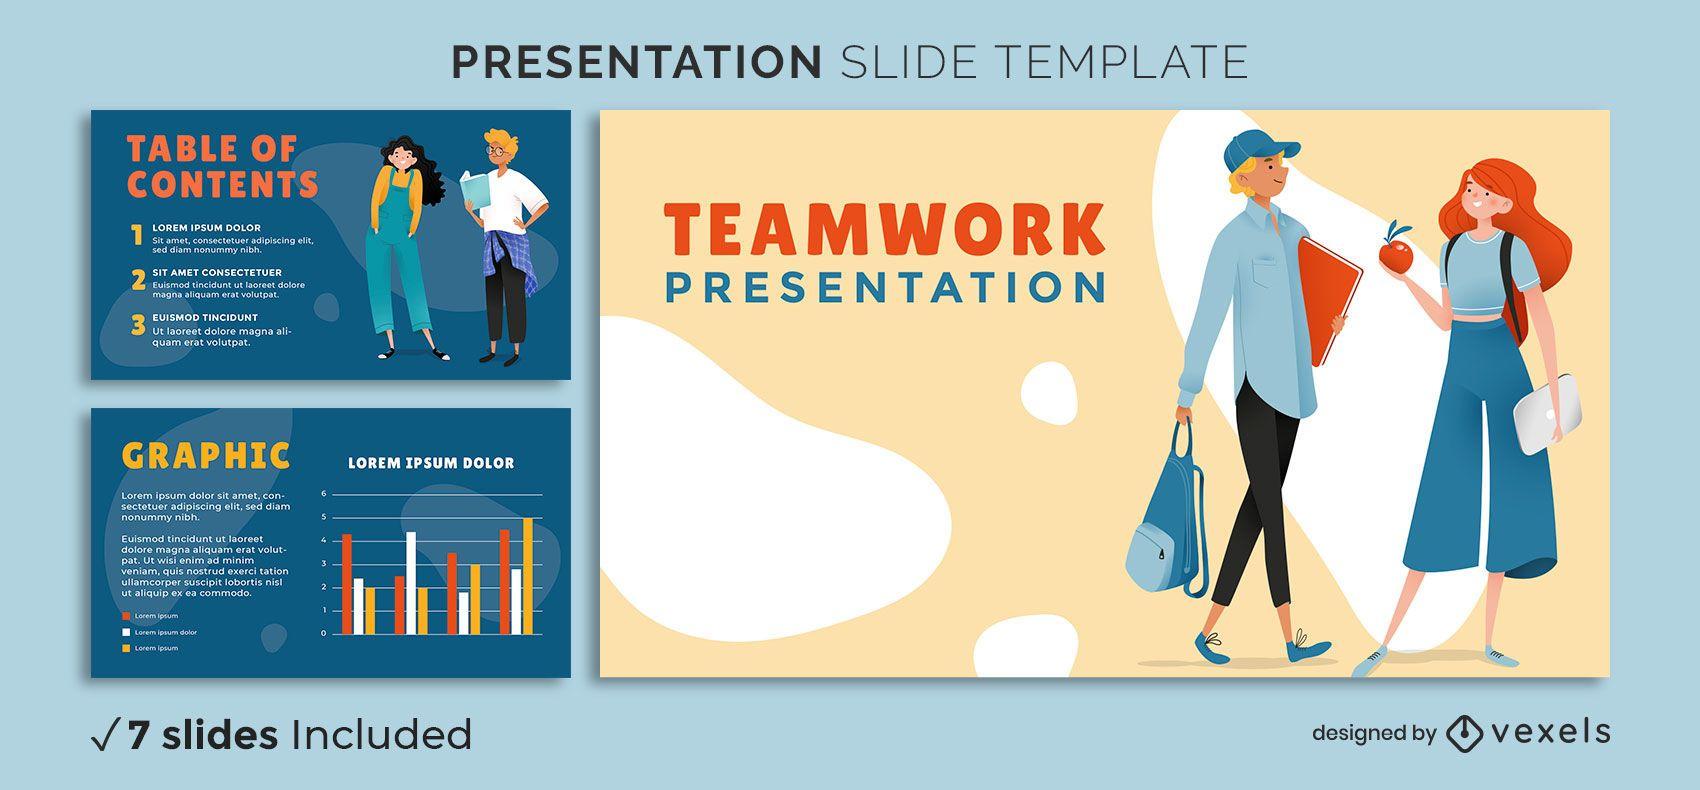 Teamwork Presentation Template